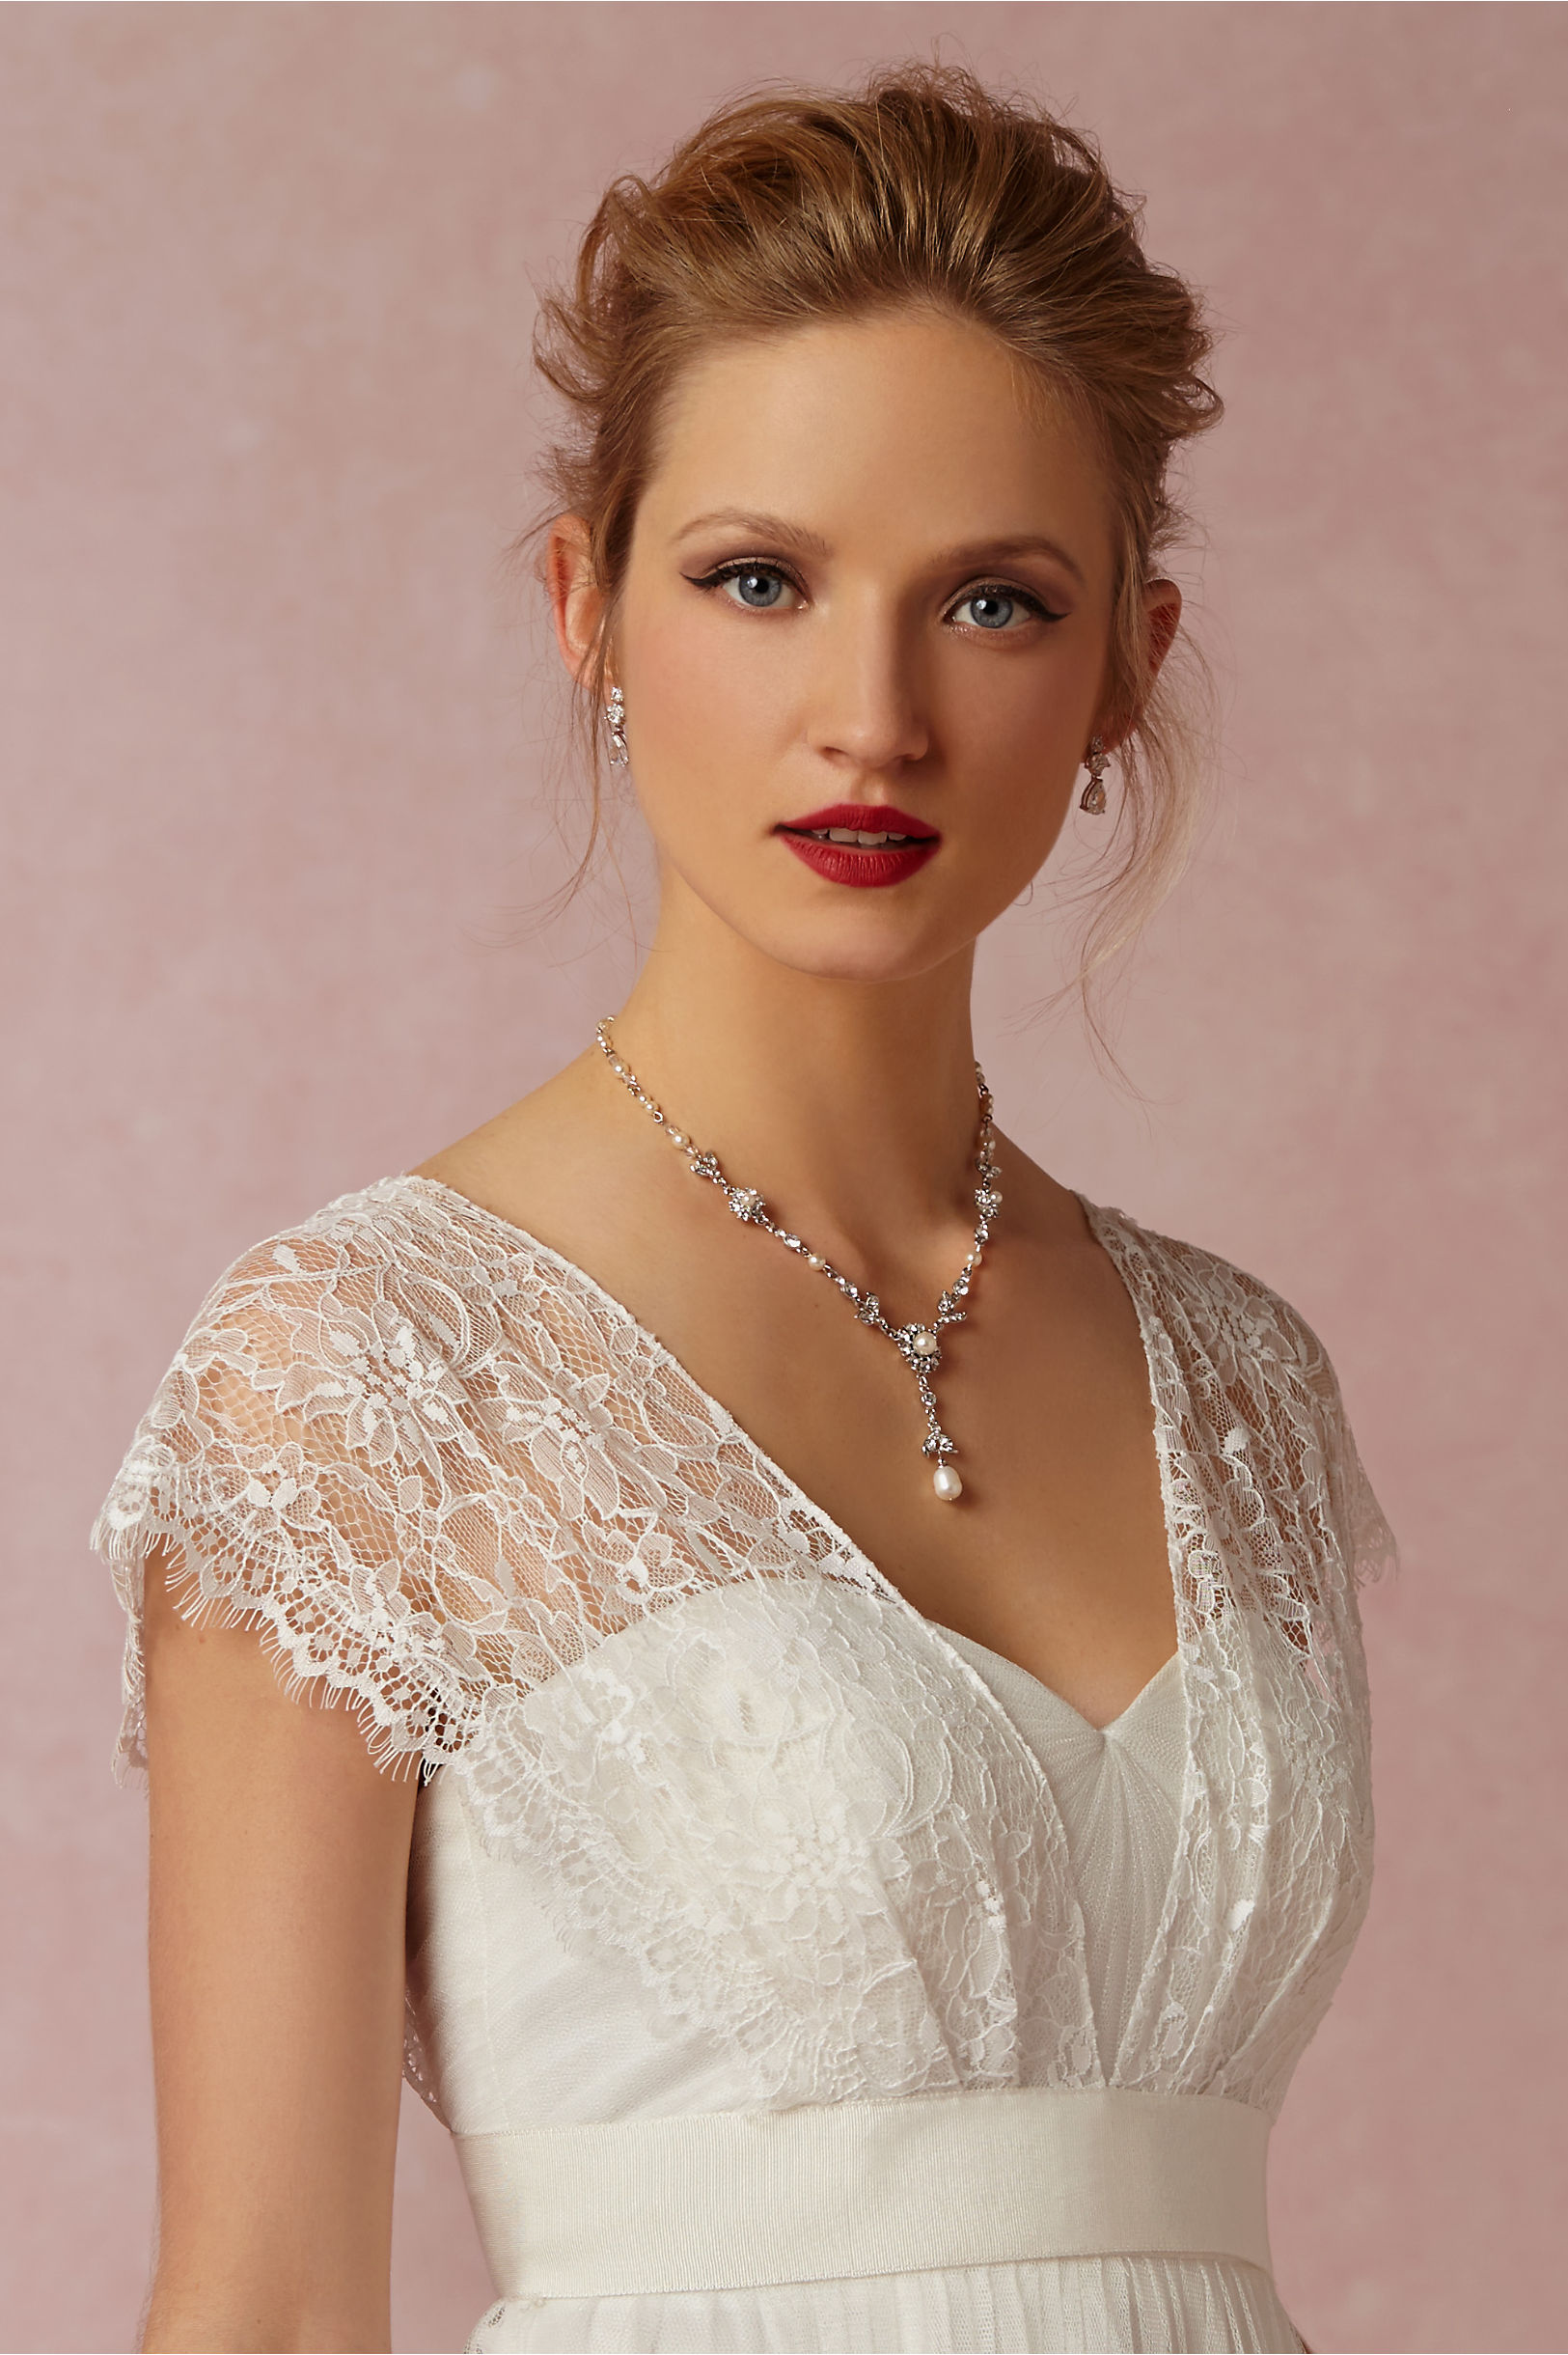 Iris Topper in Bride | BHLDN